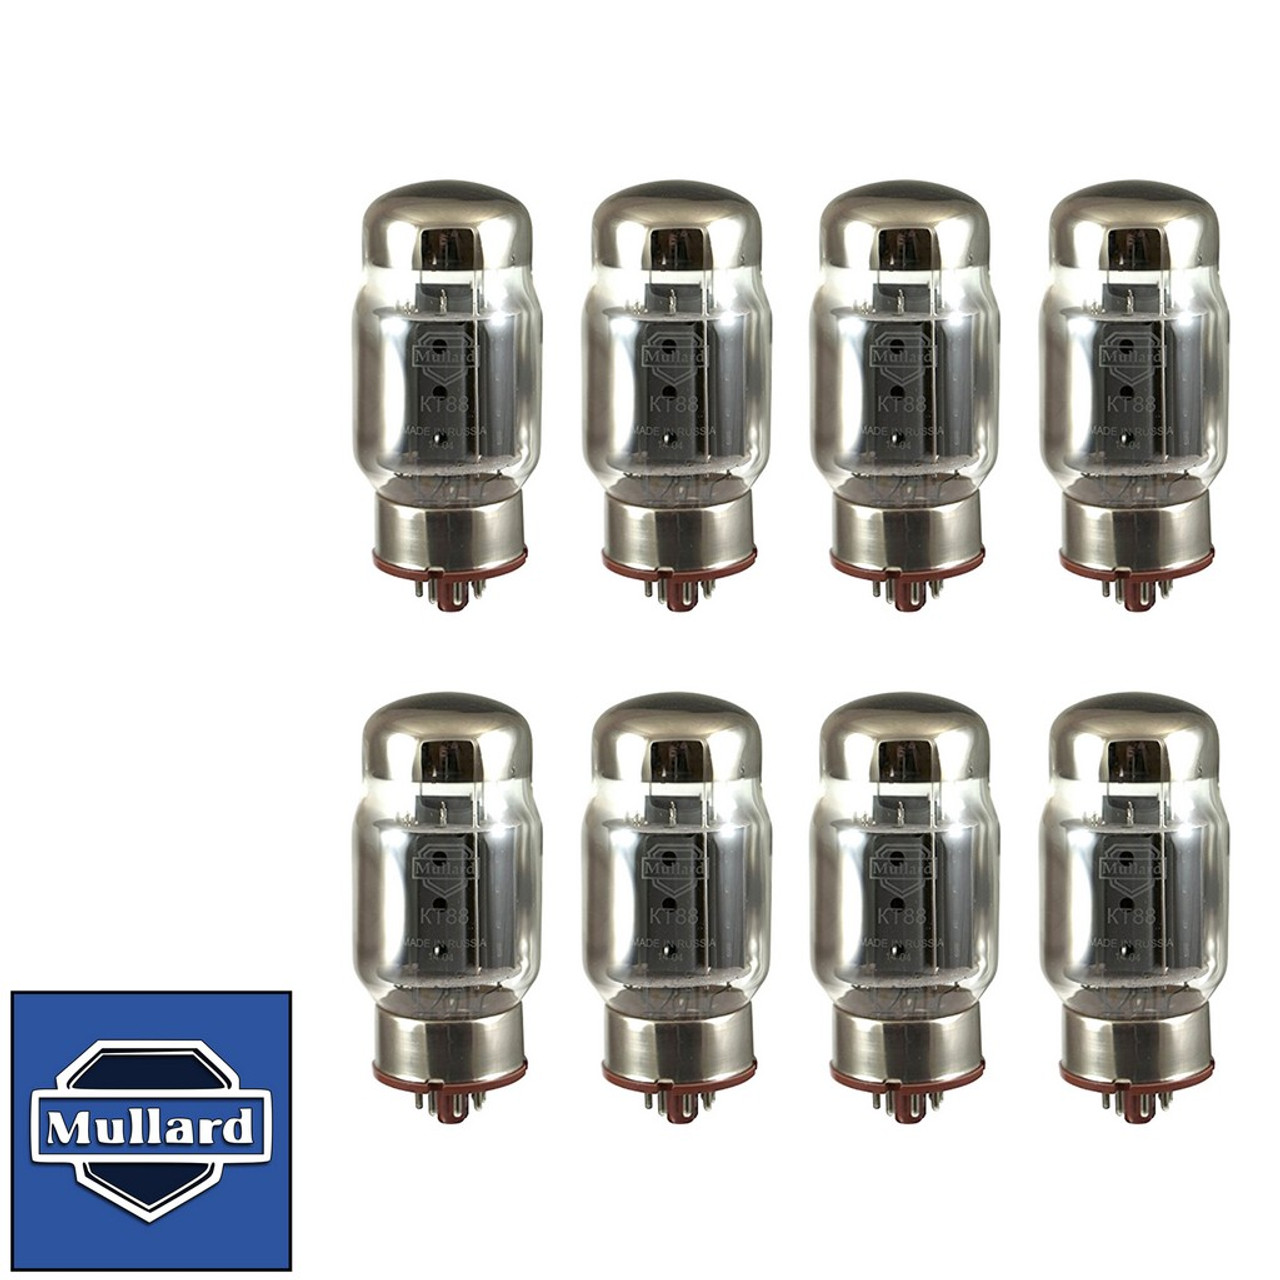 New Plate Current Matched Octet (8) Mullard Reissue KT88 / 6550 Vacuum Tubes